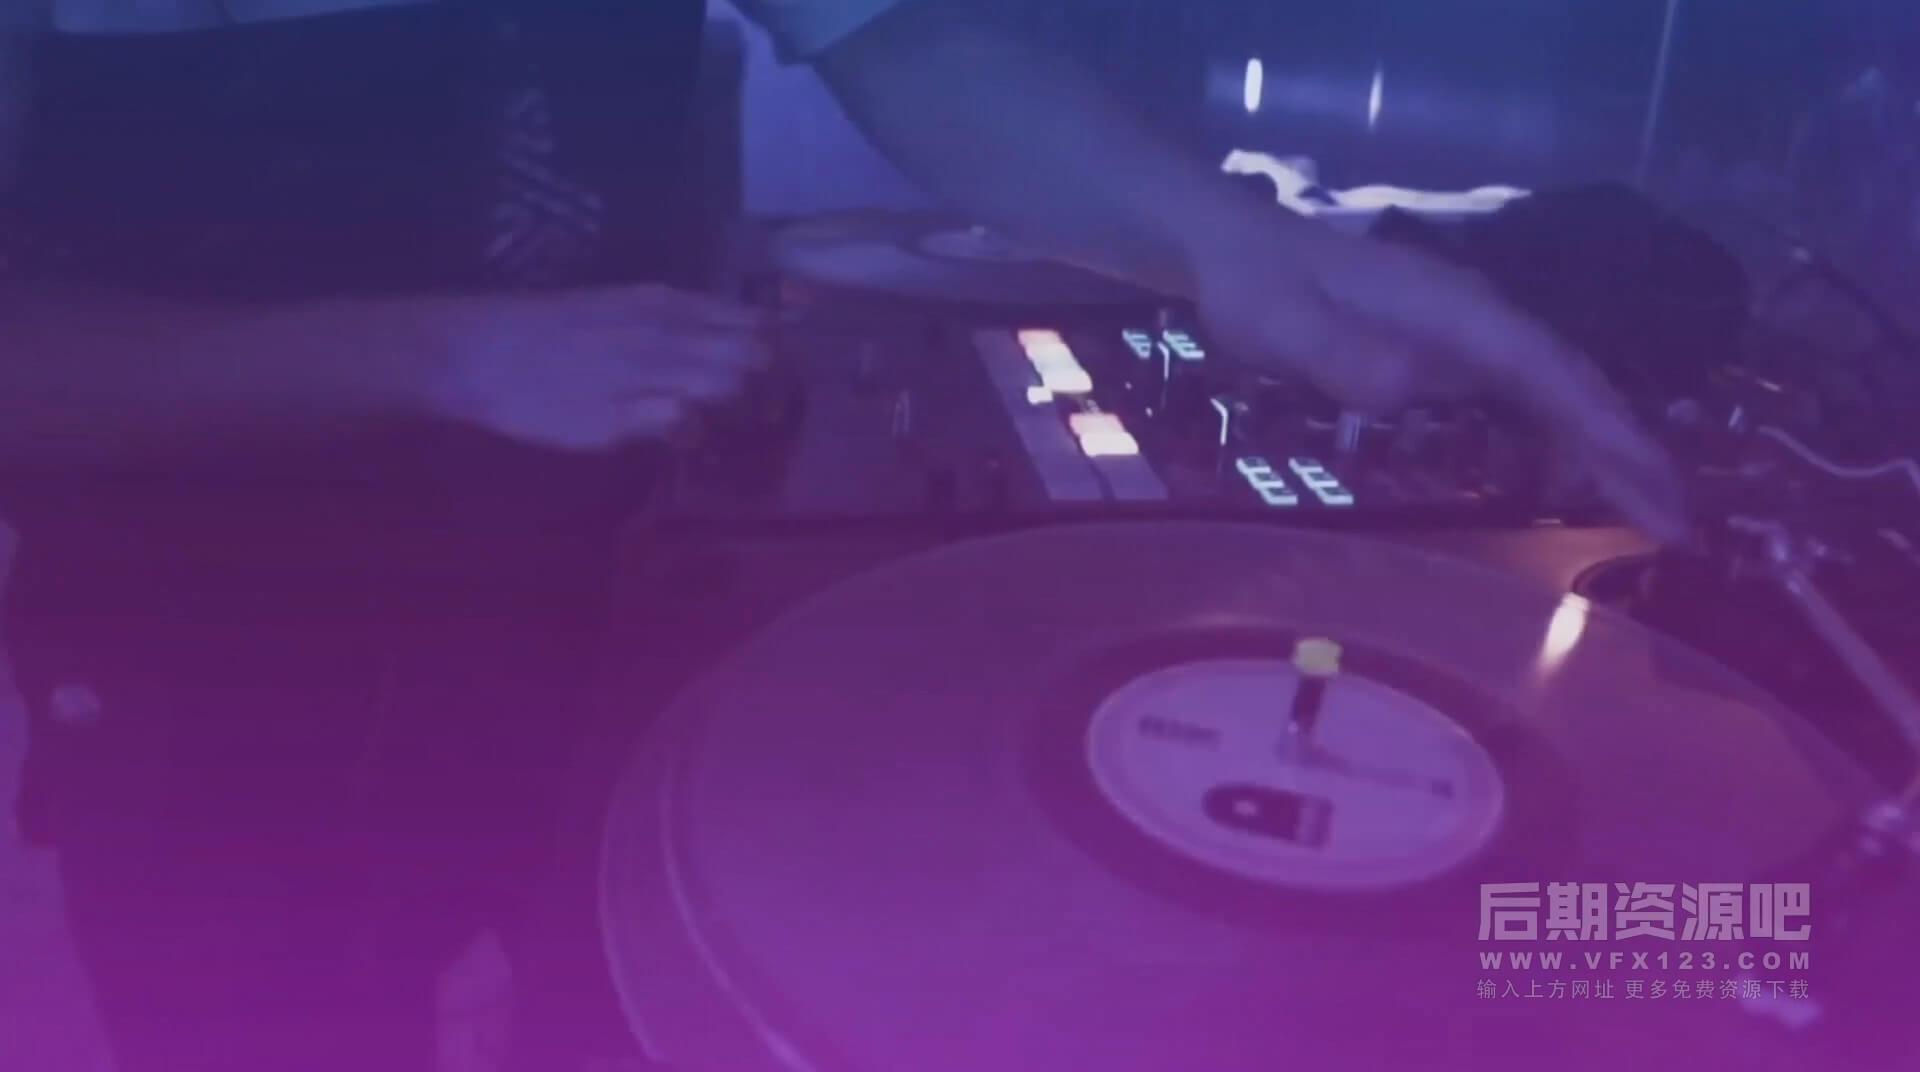 fcpx主题模板 DJ夜总会聚会俱乐部促销开场片头 DJ Promo Night Club Promo